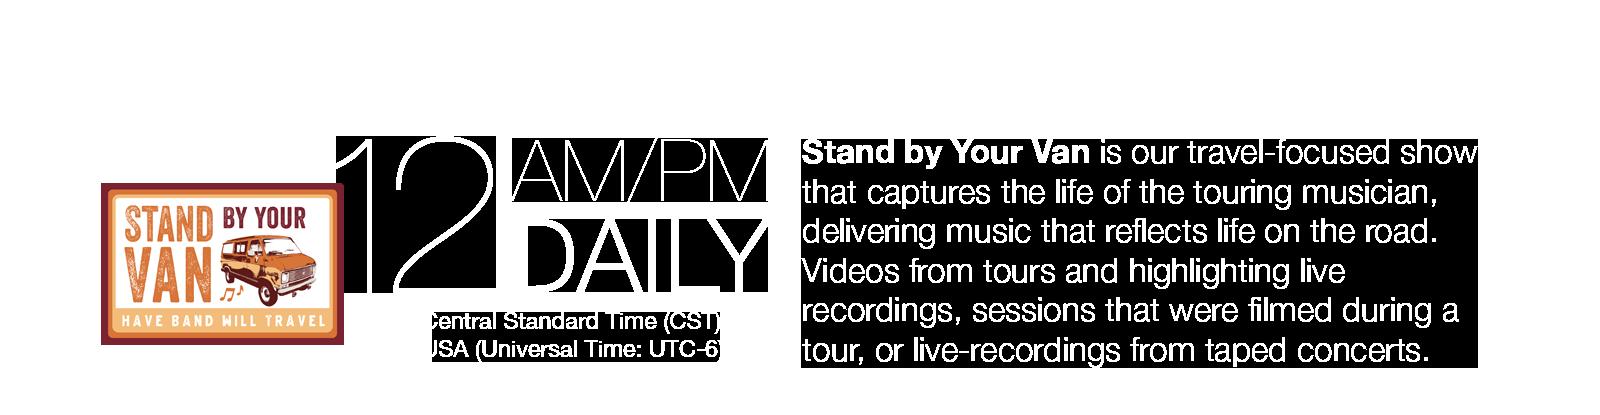 HomePageSlide-StandByYourVan12-new